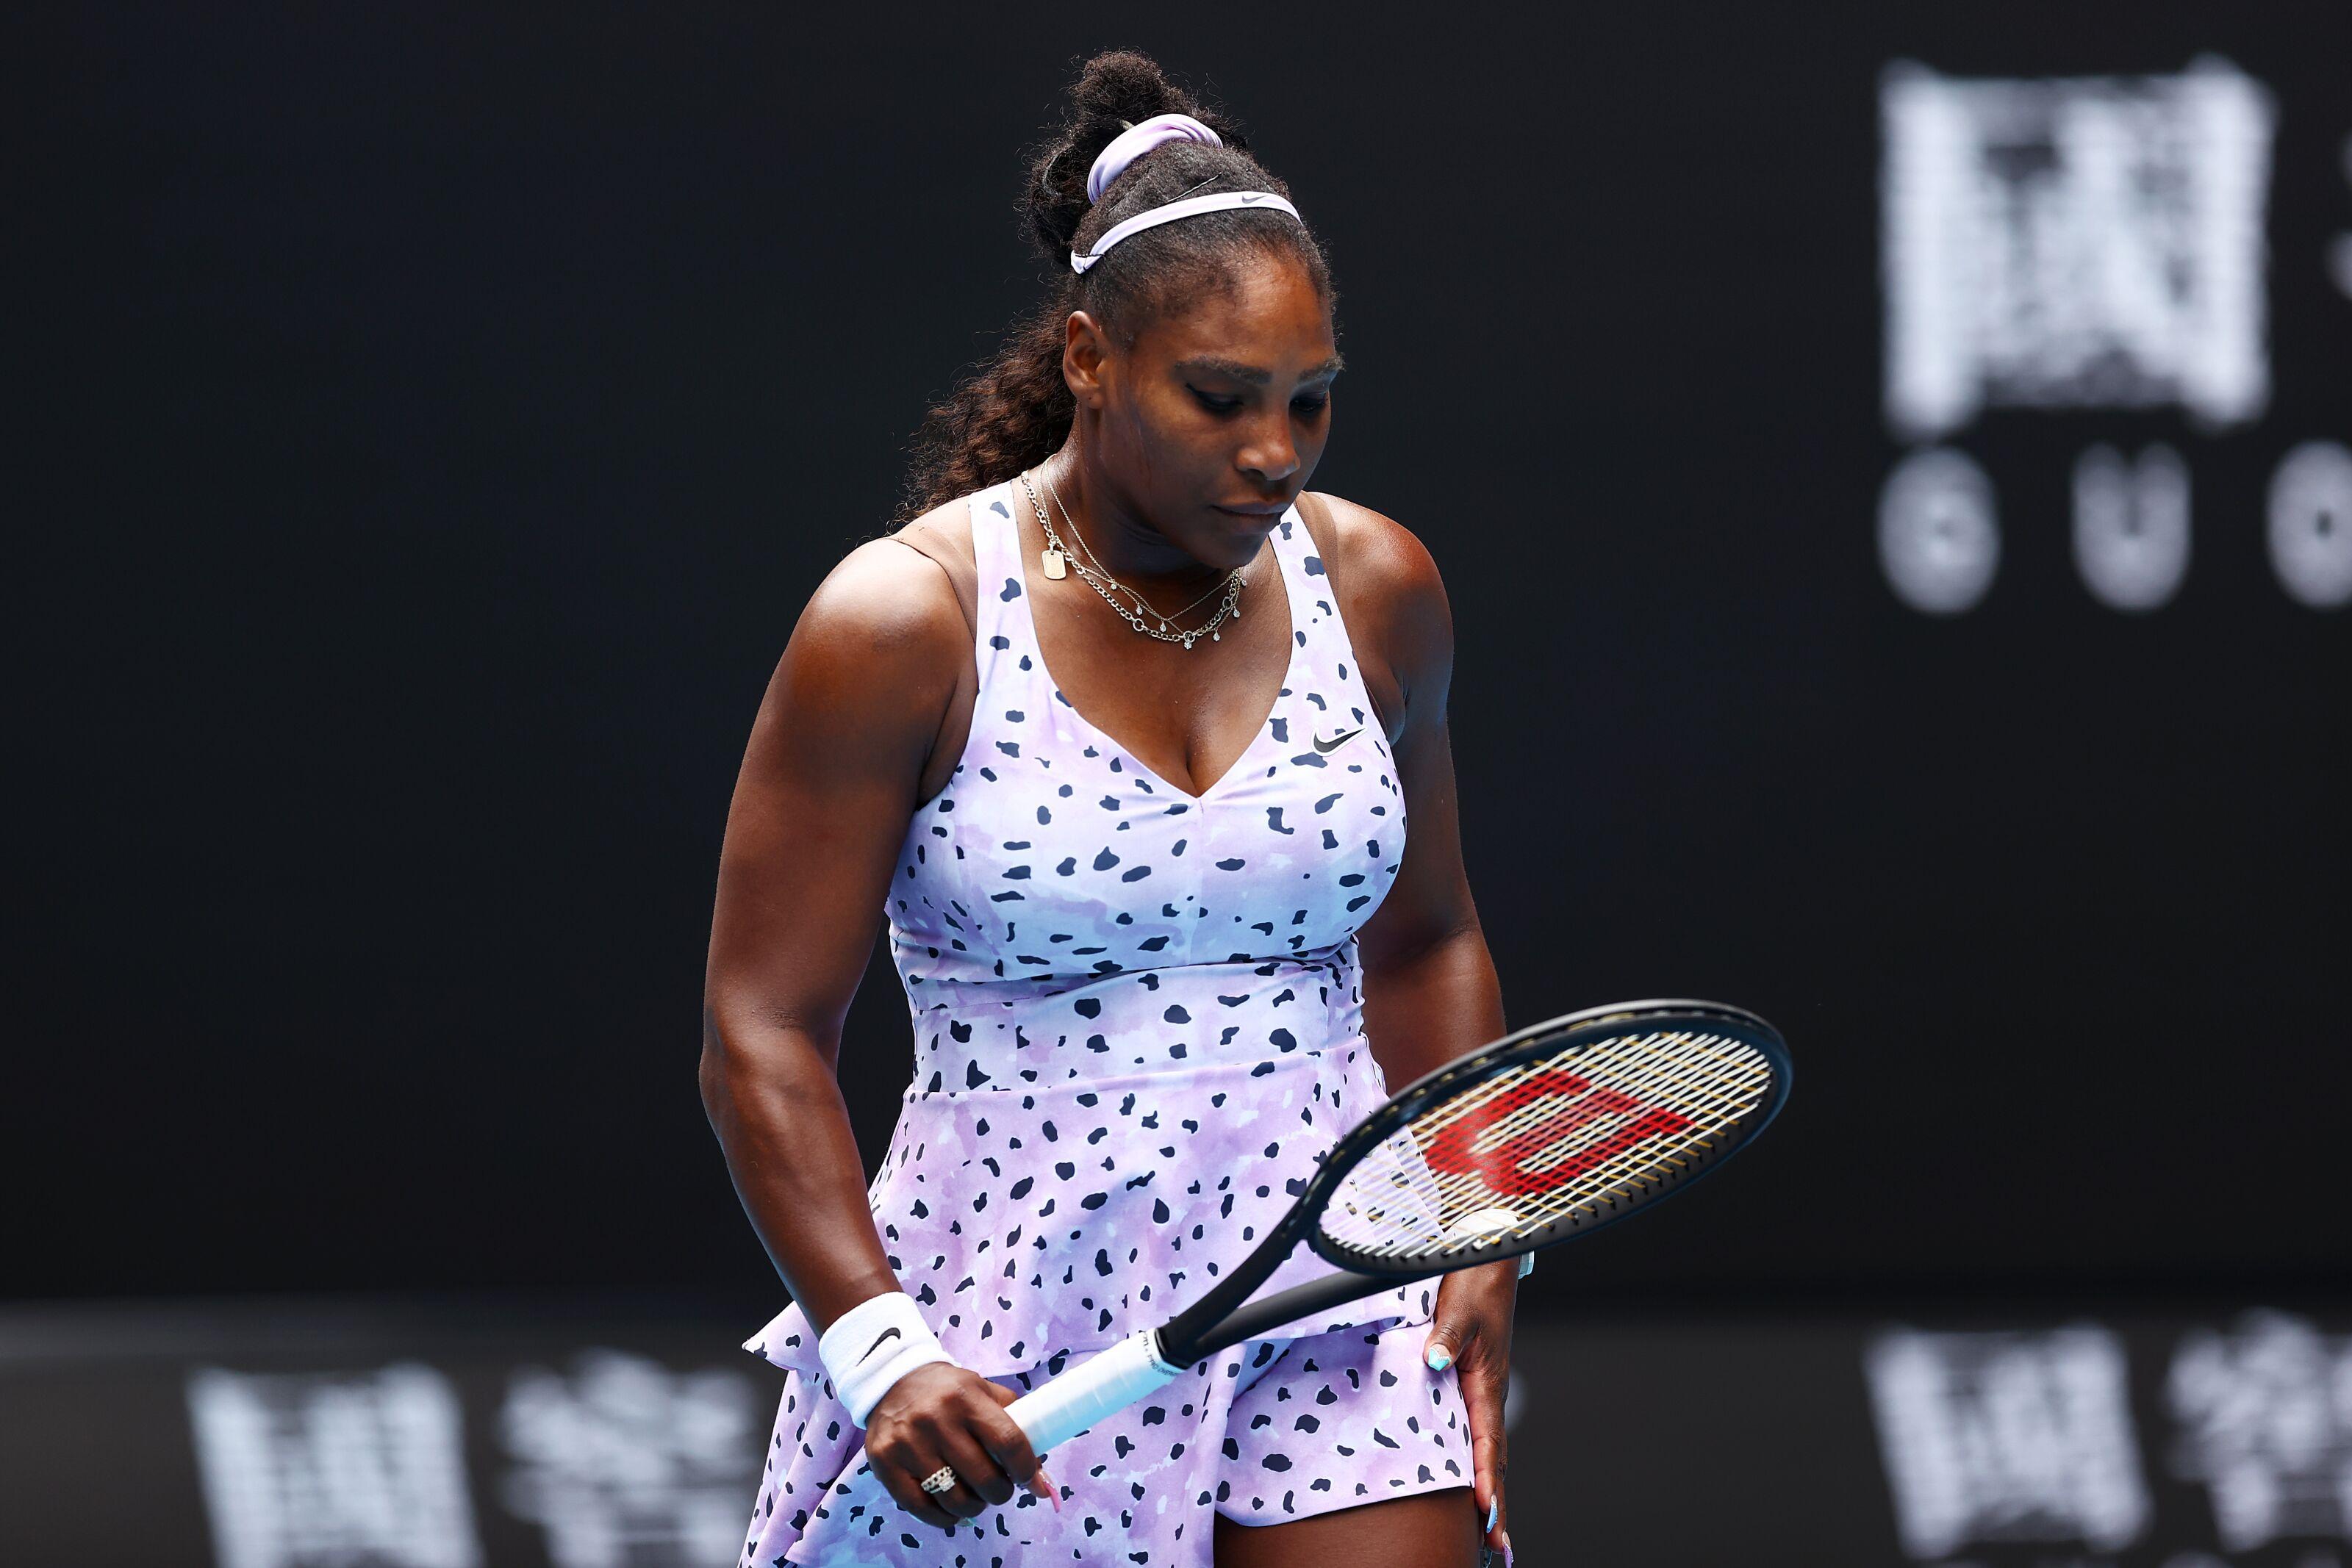 Australian Open wide open after Serena Williams, Naomi Osaka shocks